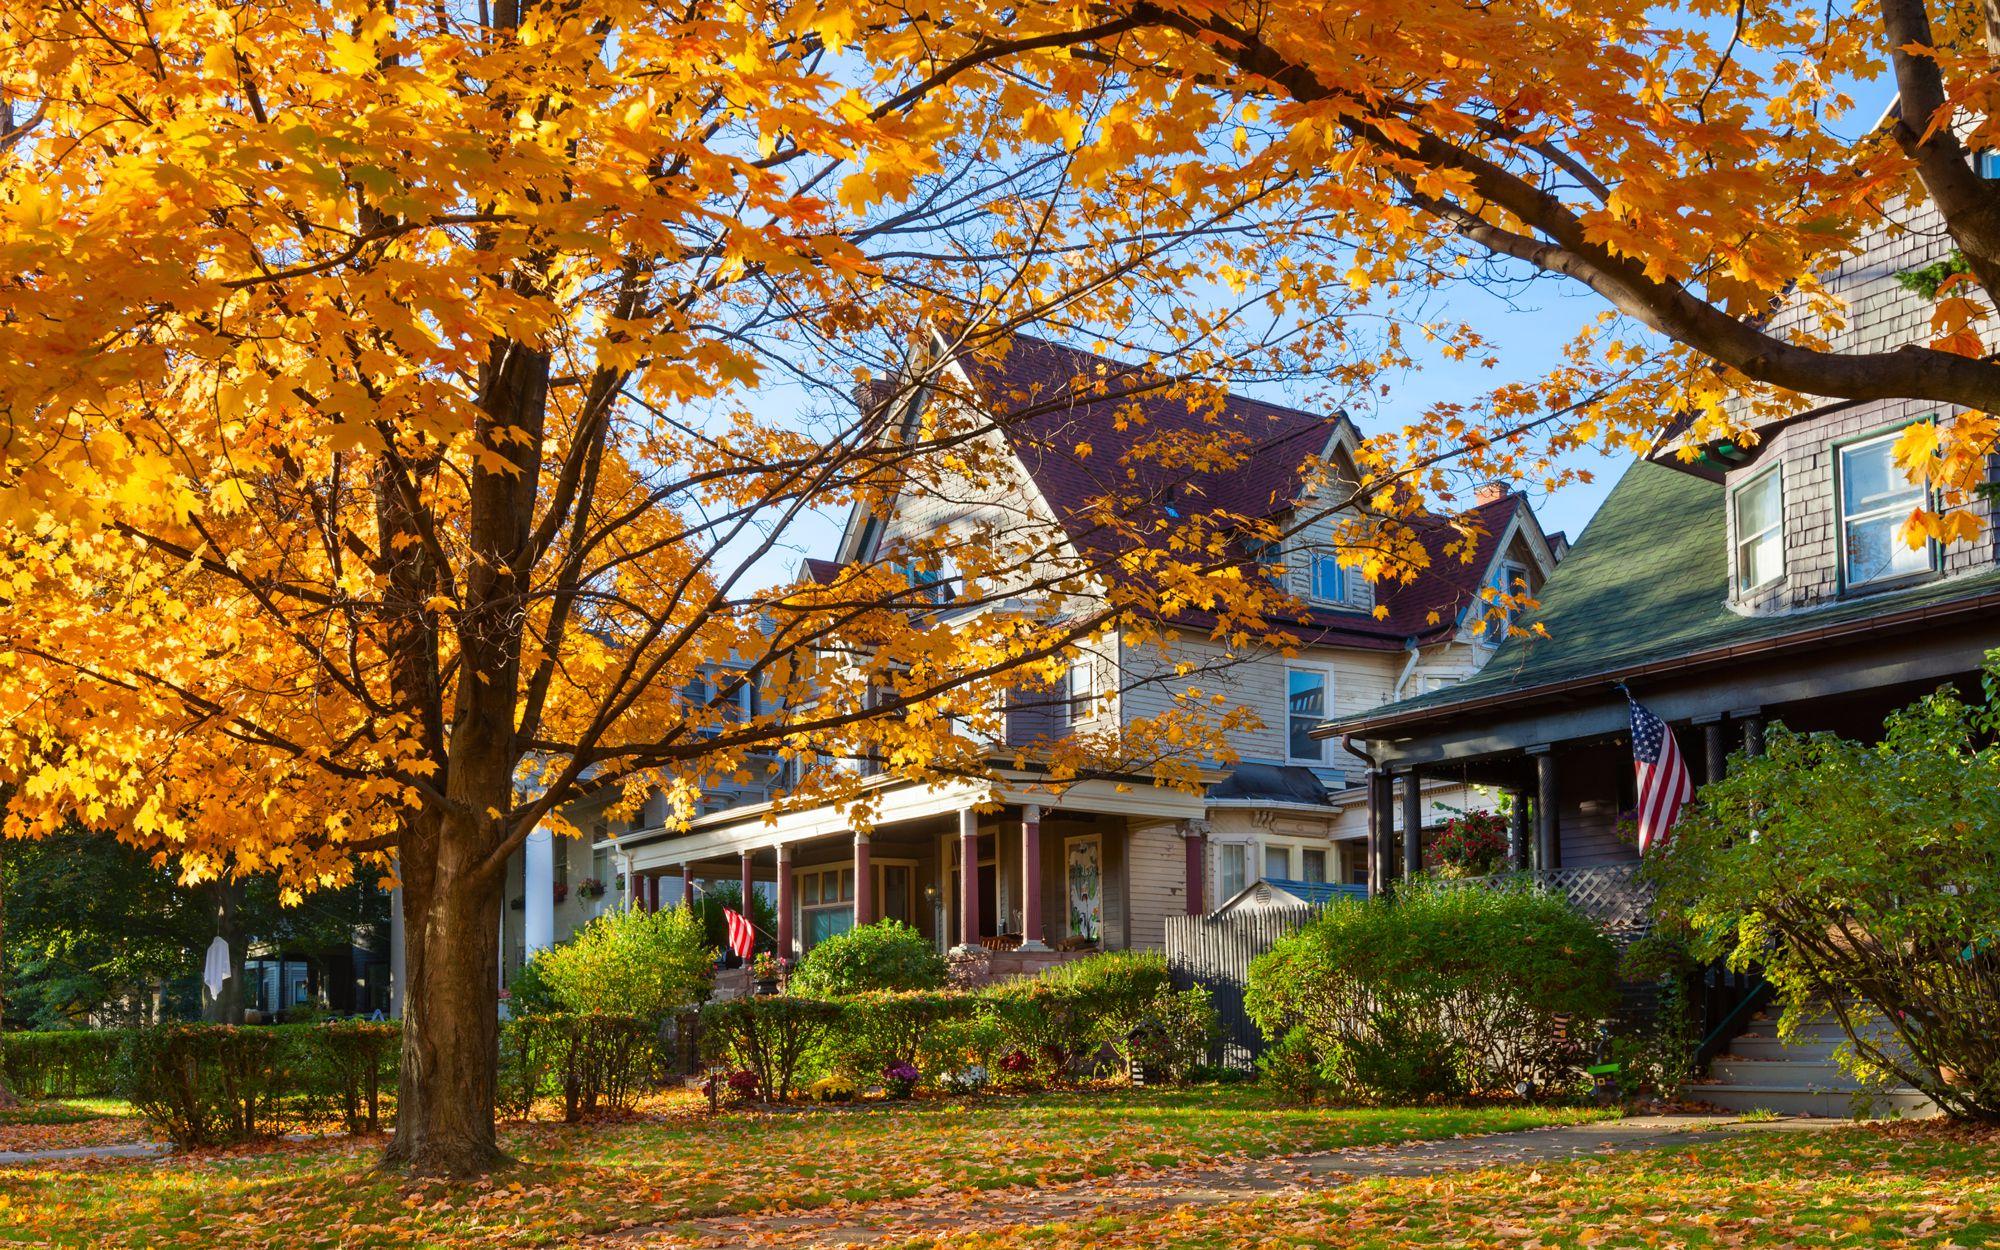 Elmwood Village Autumn